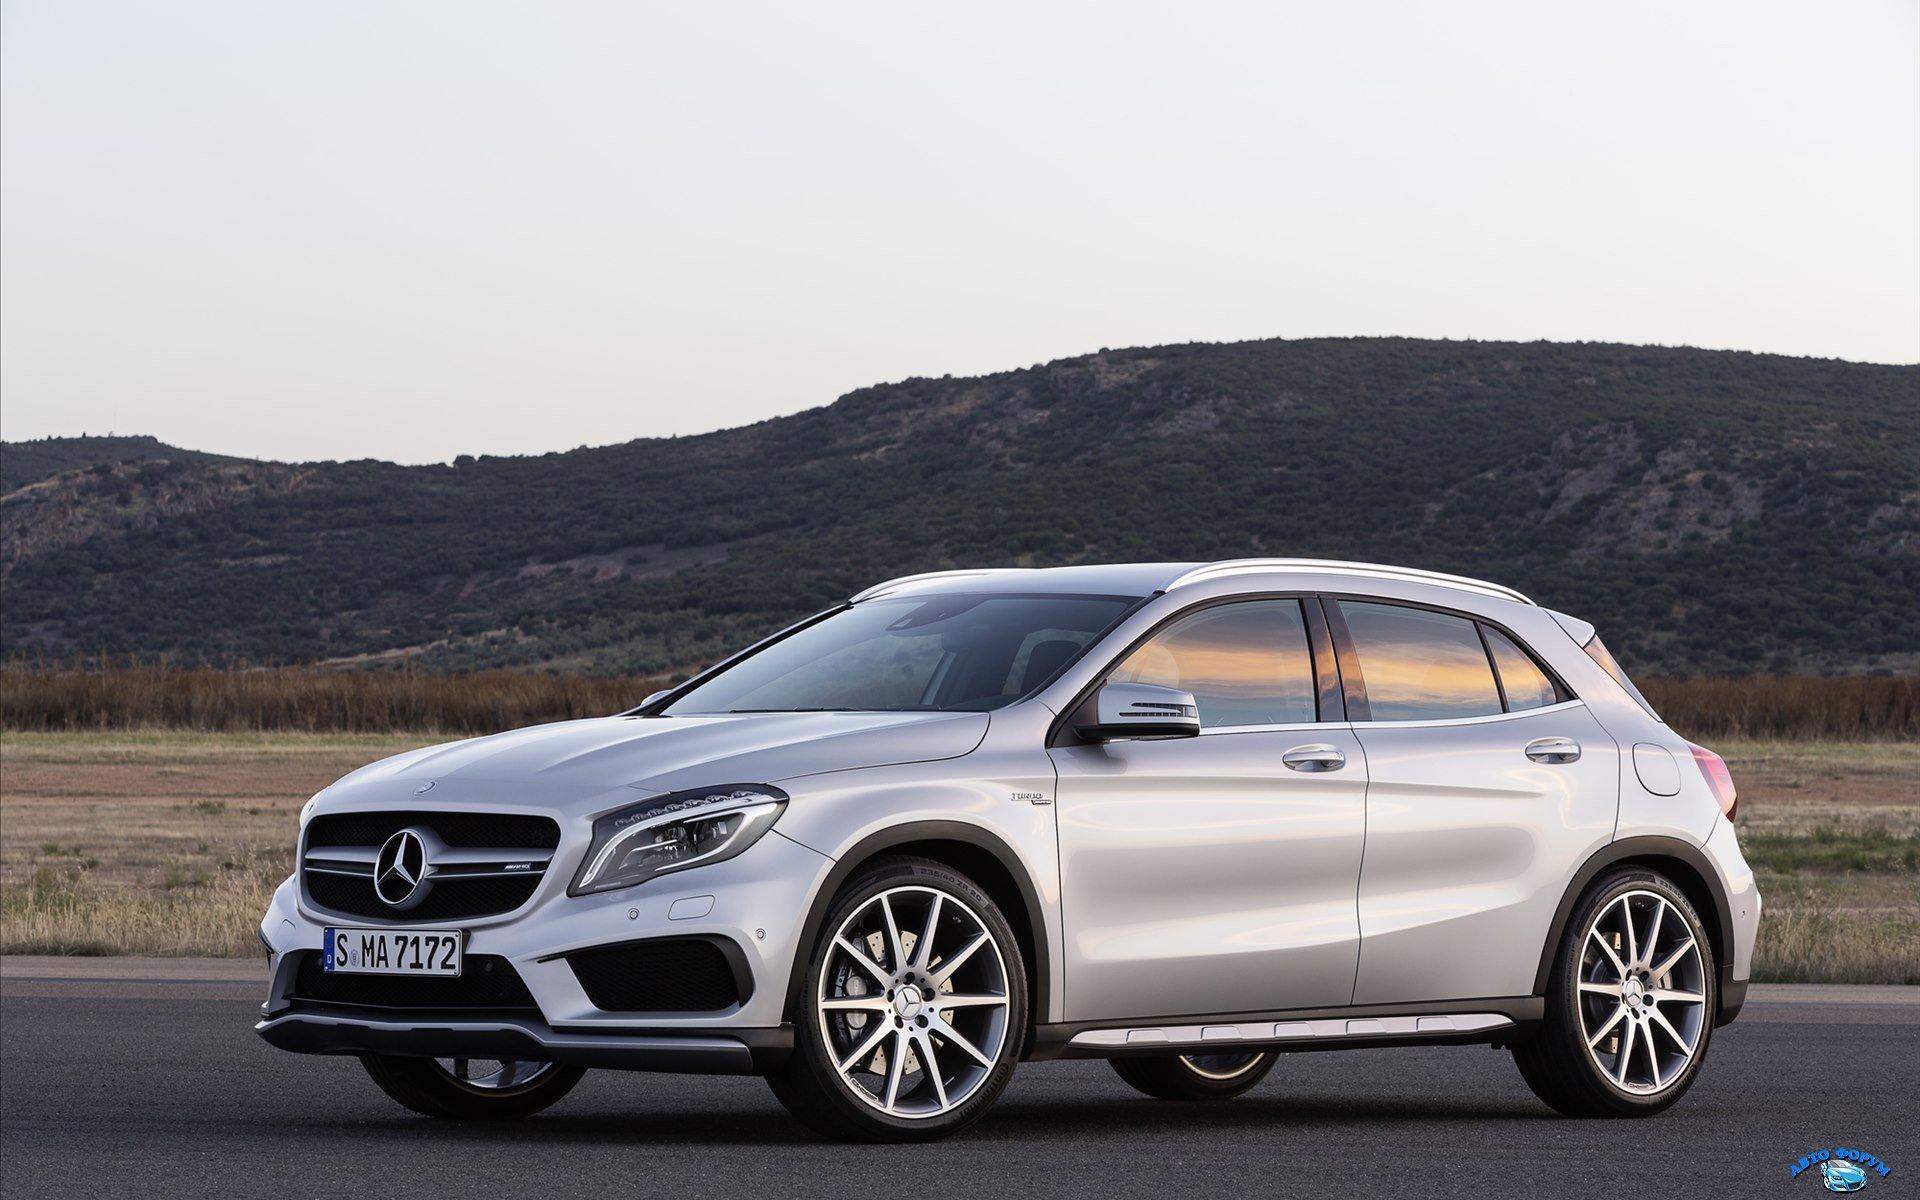 Mercedes-Benz-GLA-45-AMG-2014-widescreen-01.jpg